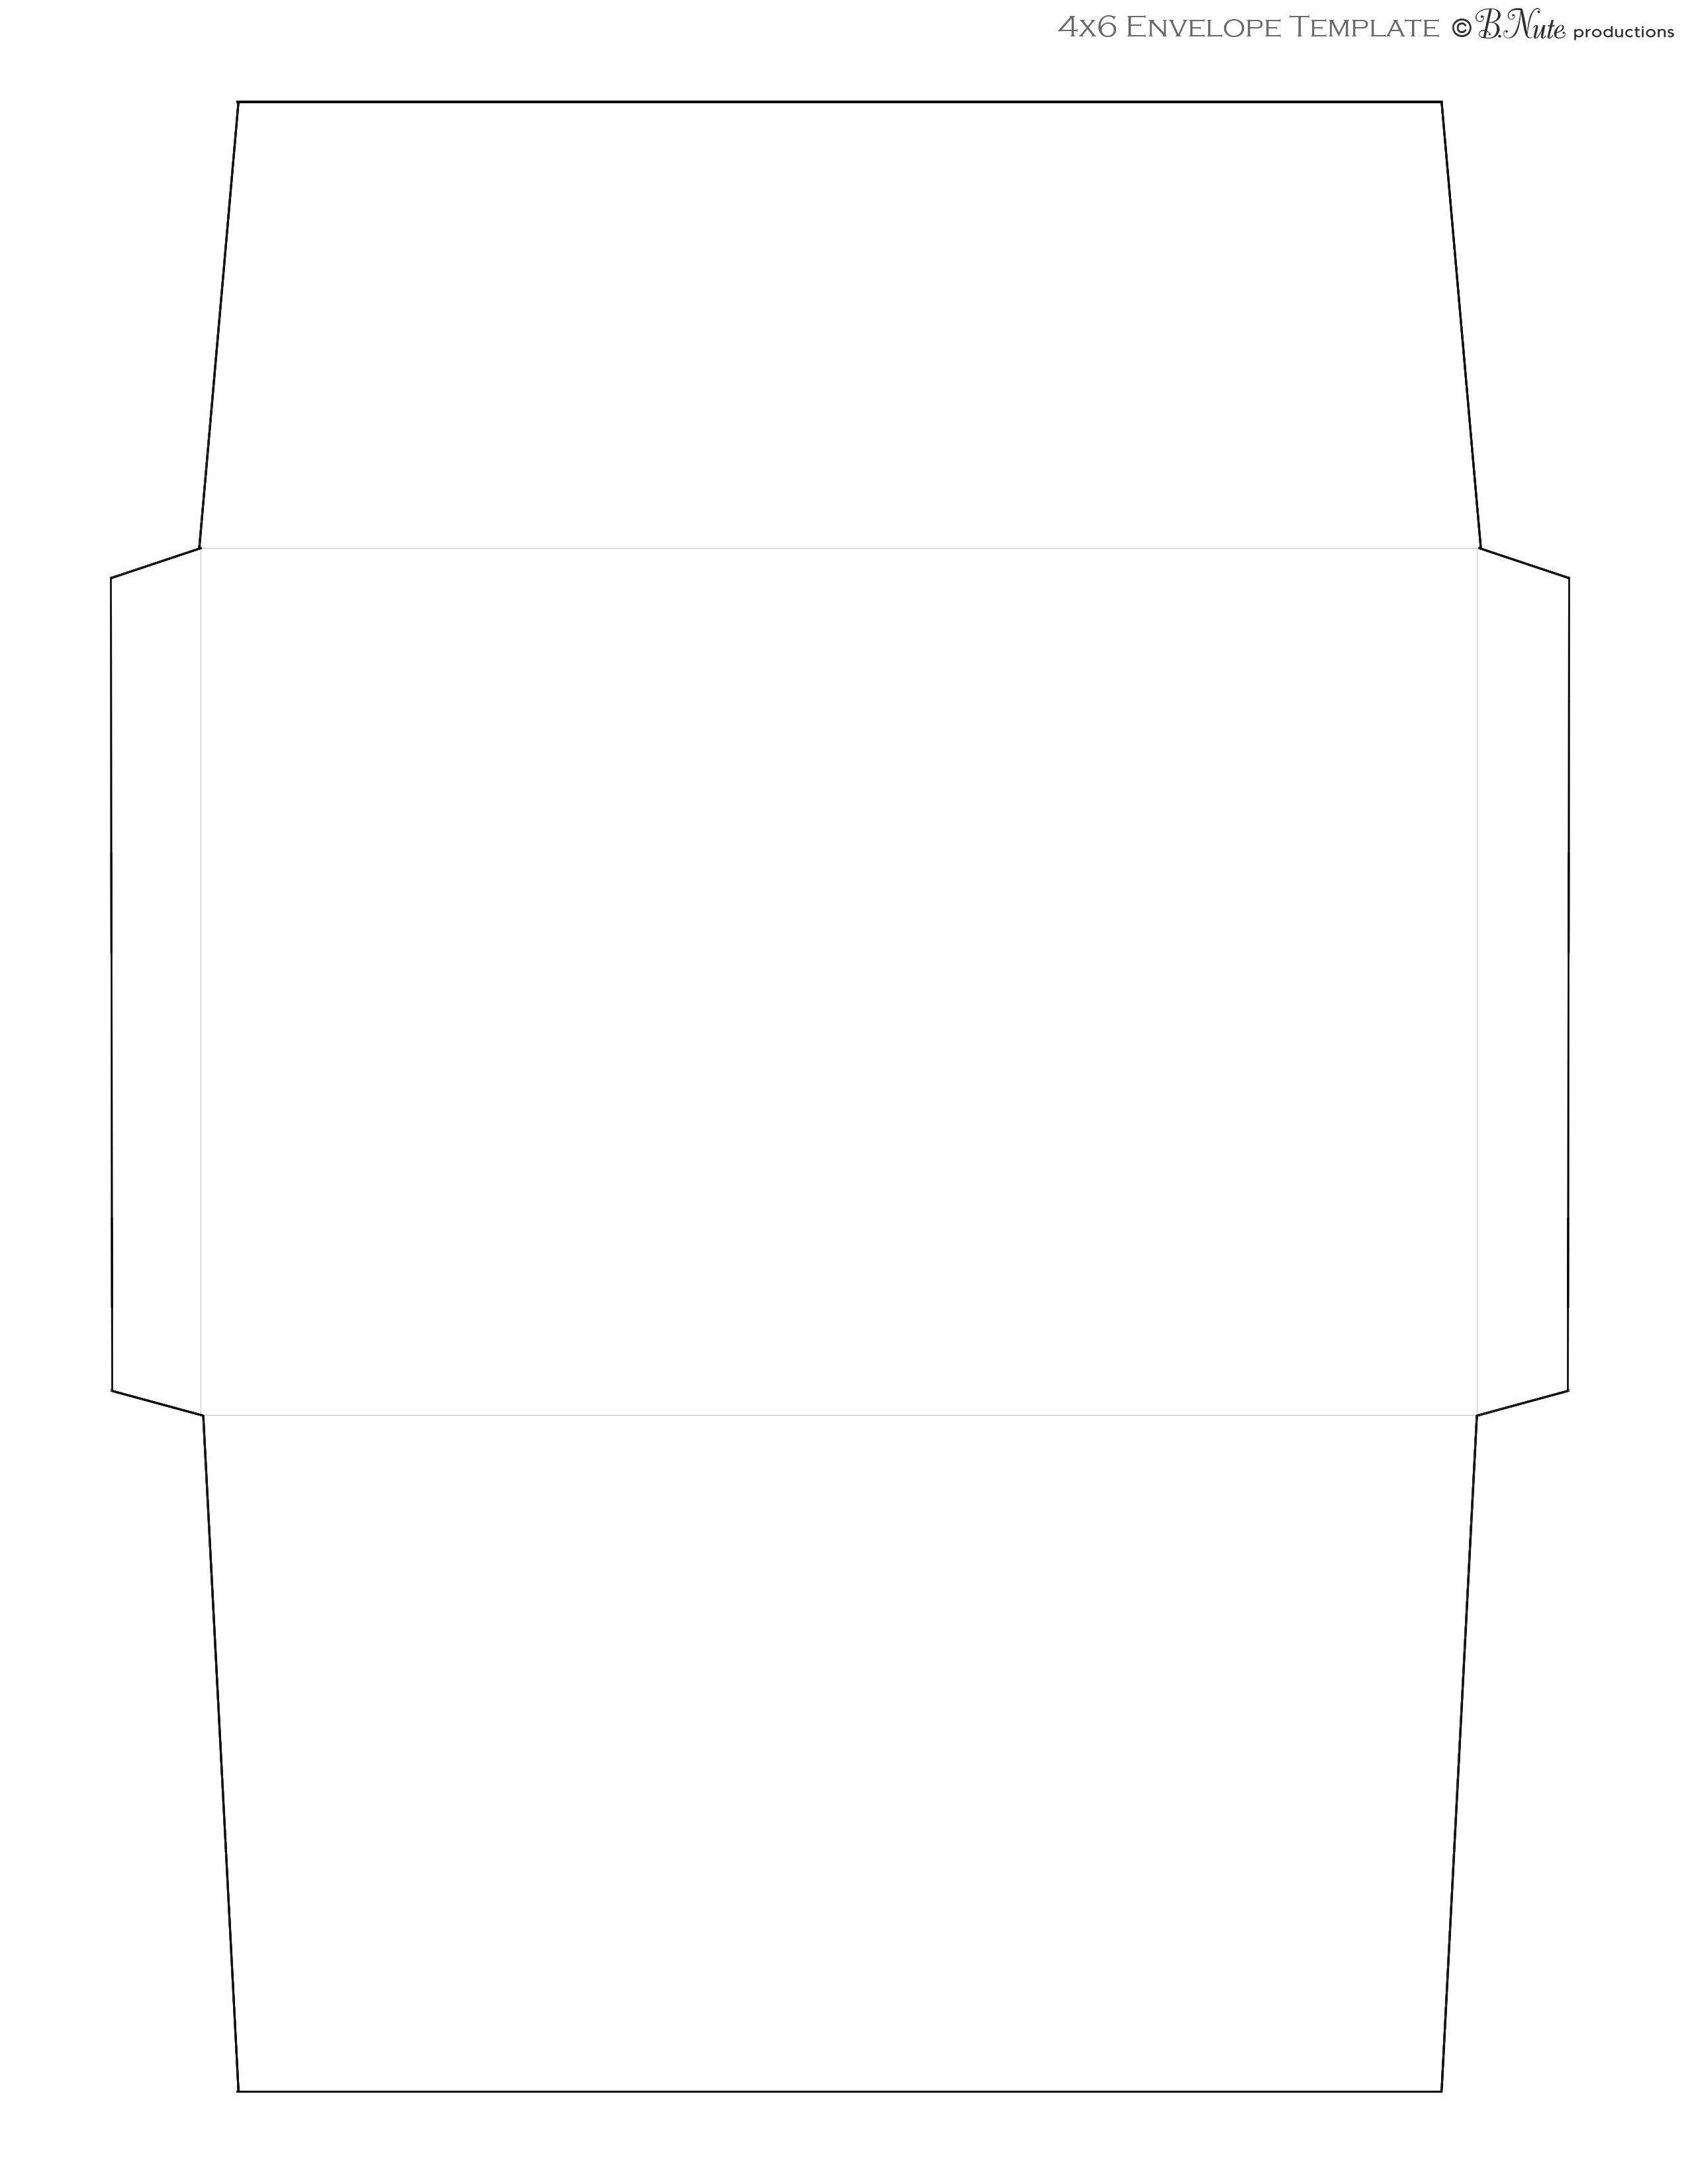 Free Printable Envelope Templates Bnute Productions Scrapbook Paper Ideas Printed Envelope